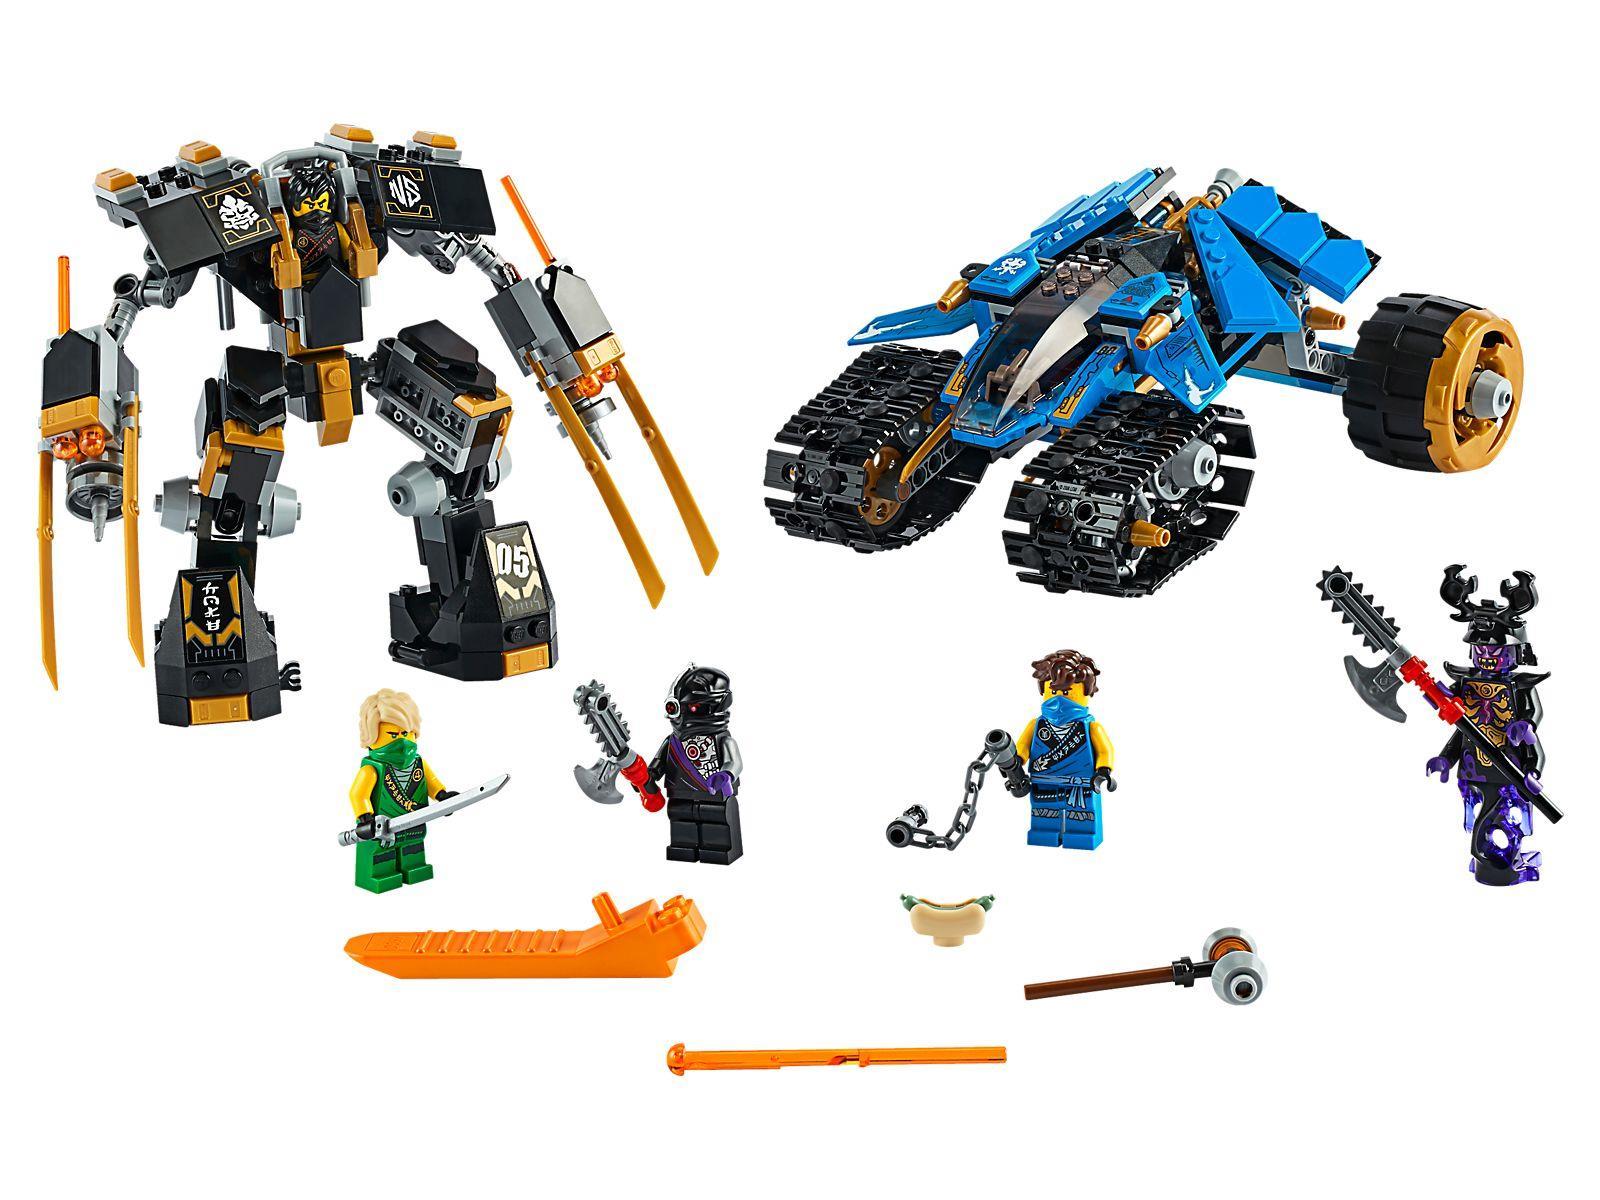 Lego 71699 Ninjago Legacy Thunder Raider Brickeconomy